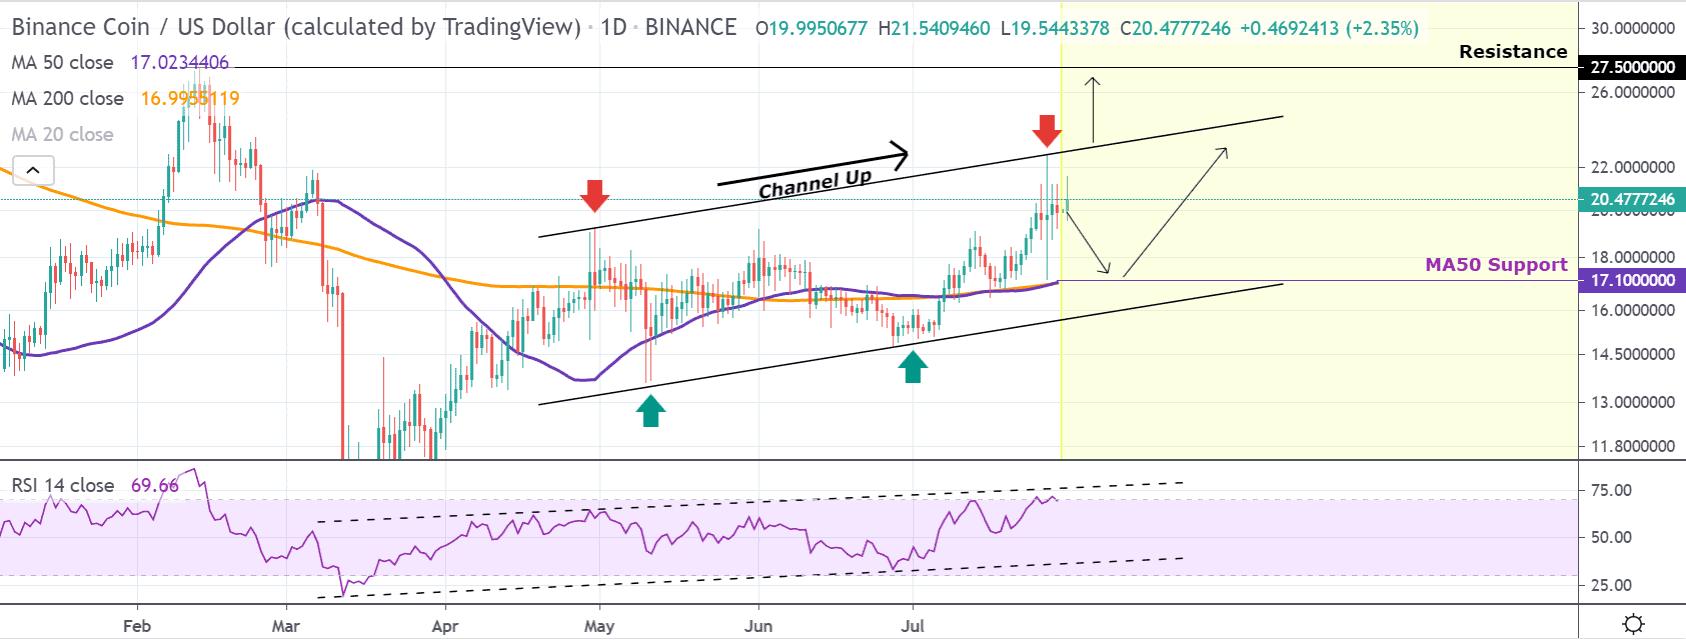 Binance Coin price chart 2 - 31 July